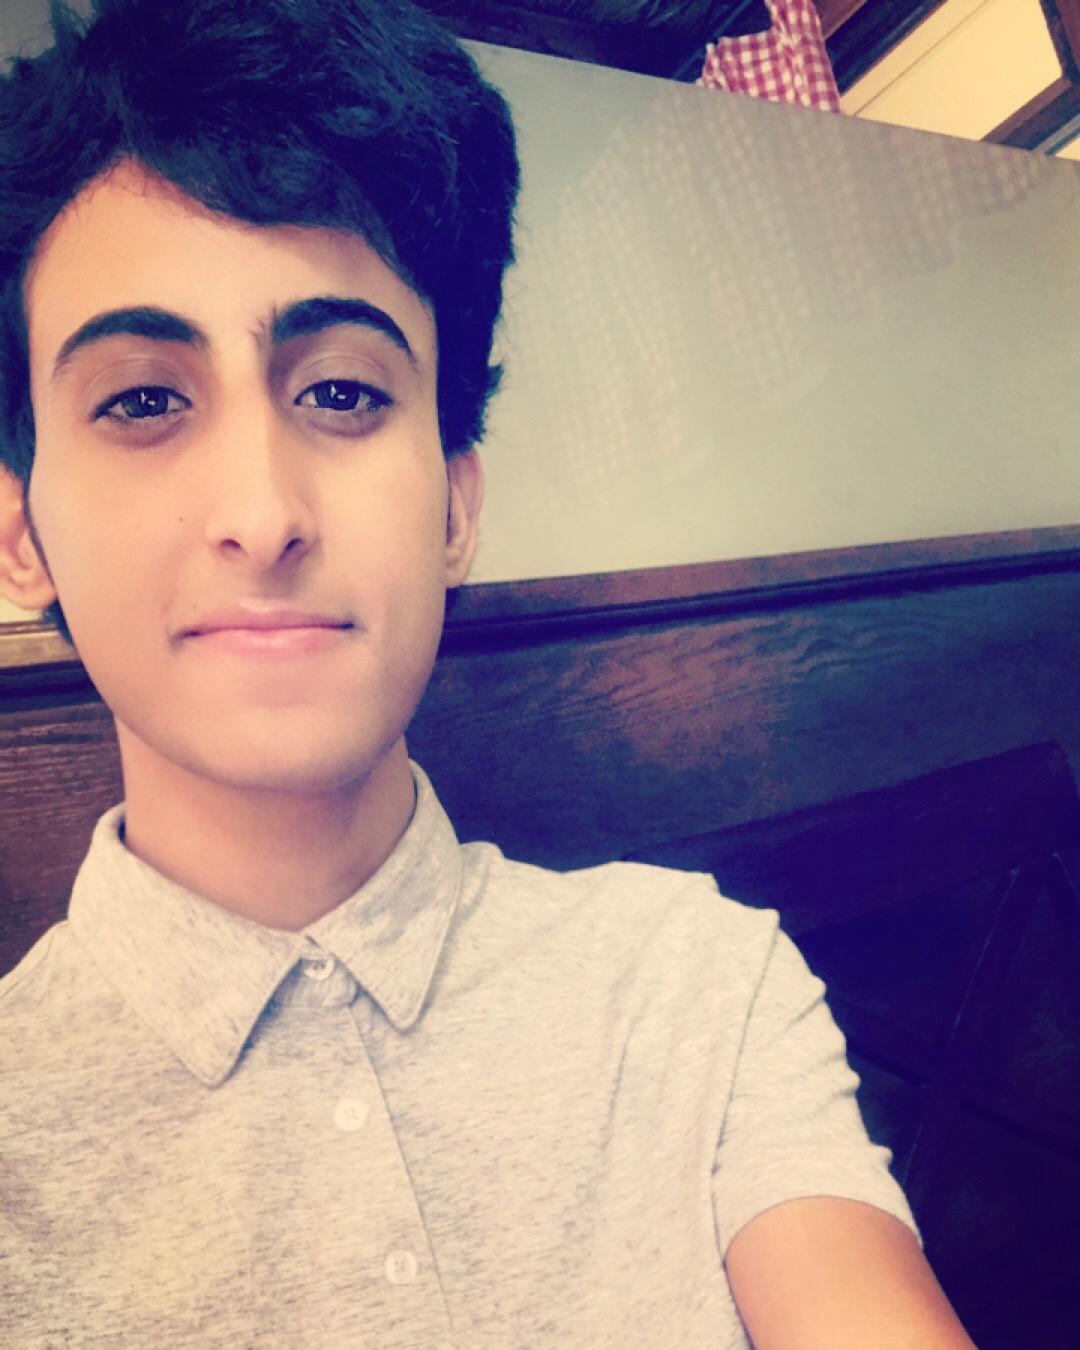 Khaled Al-Anzy